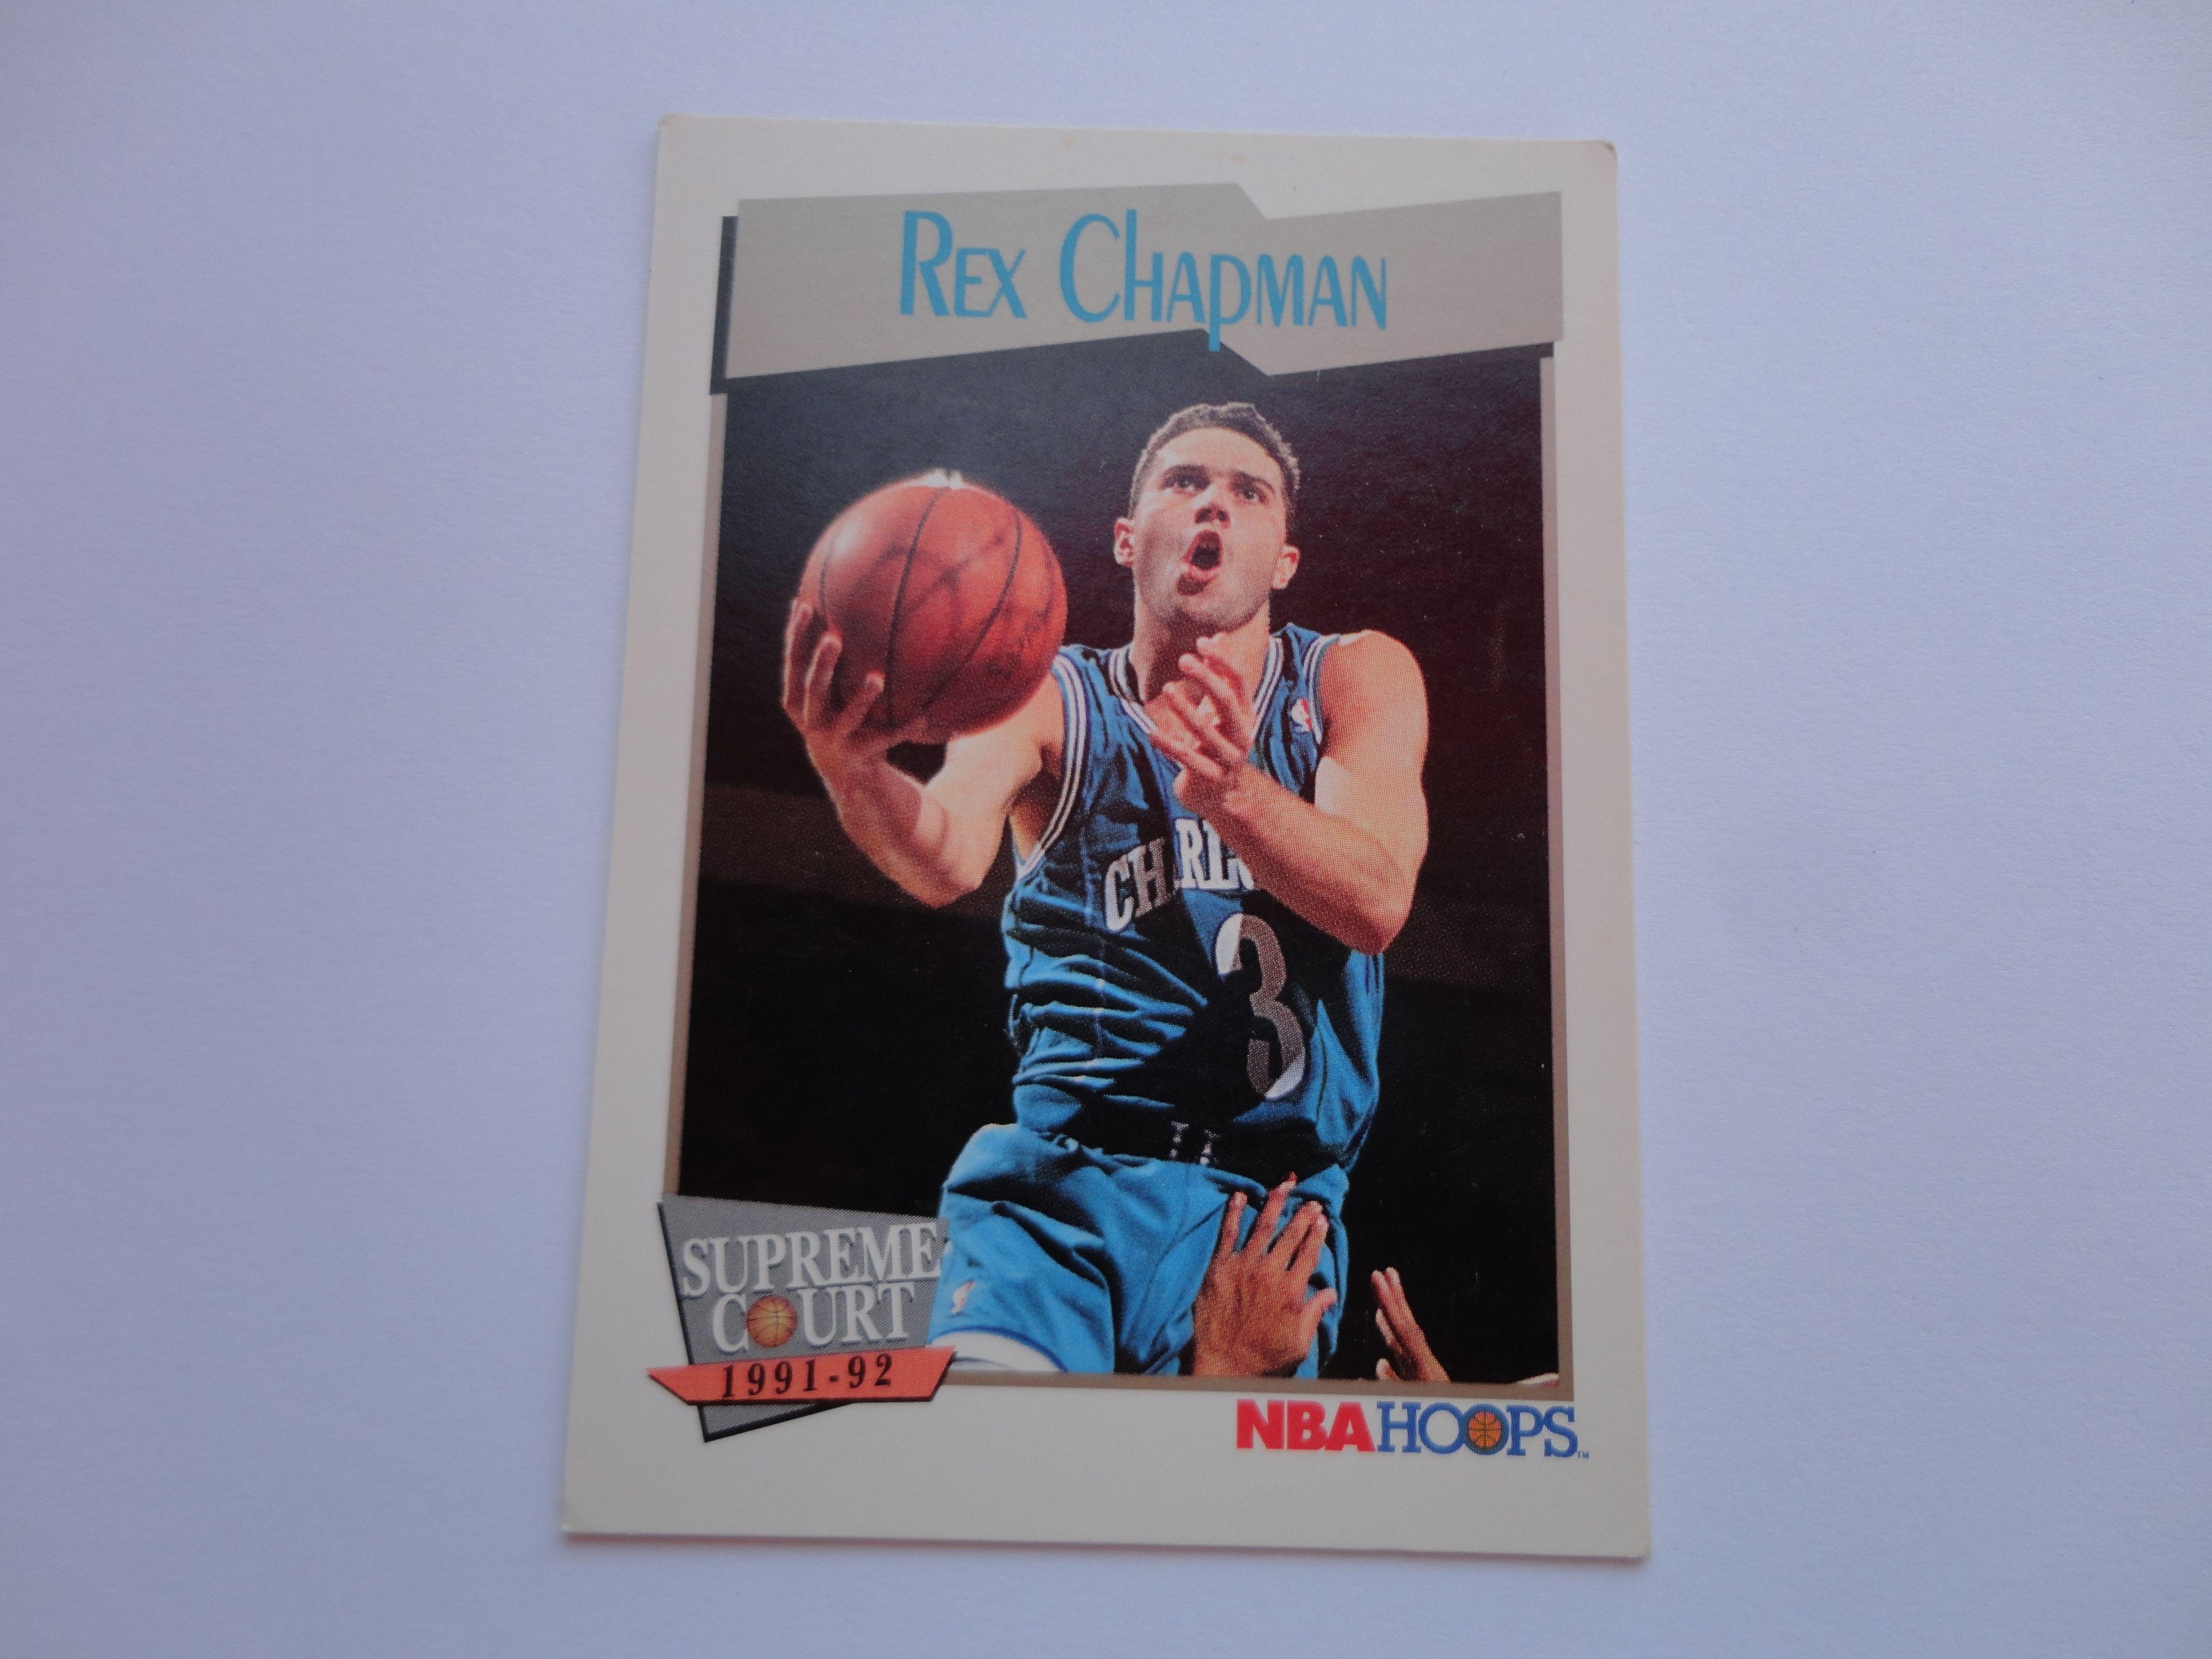 Rex Chapman NBA Hoops Supreme Court 1991 92 Basketball Card